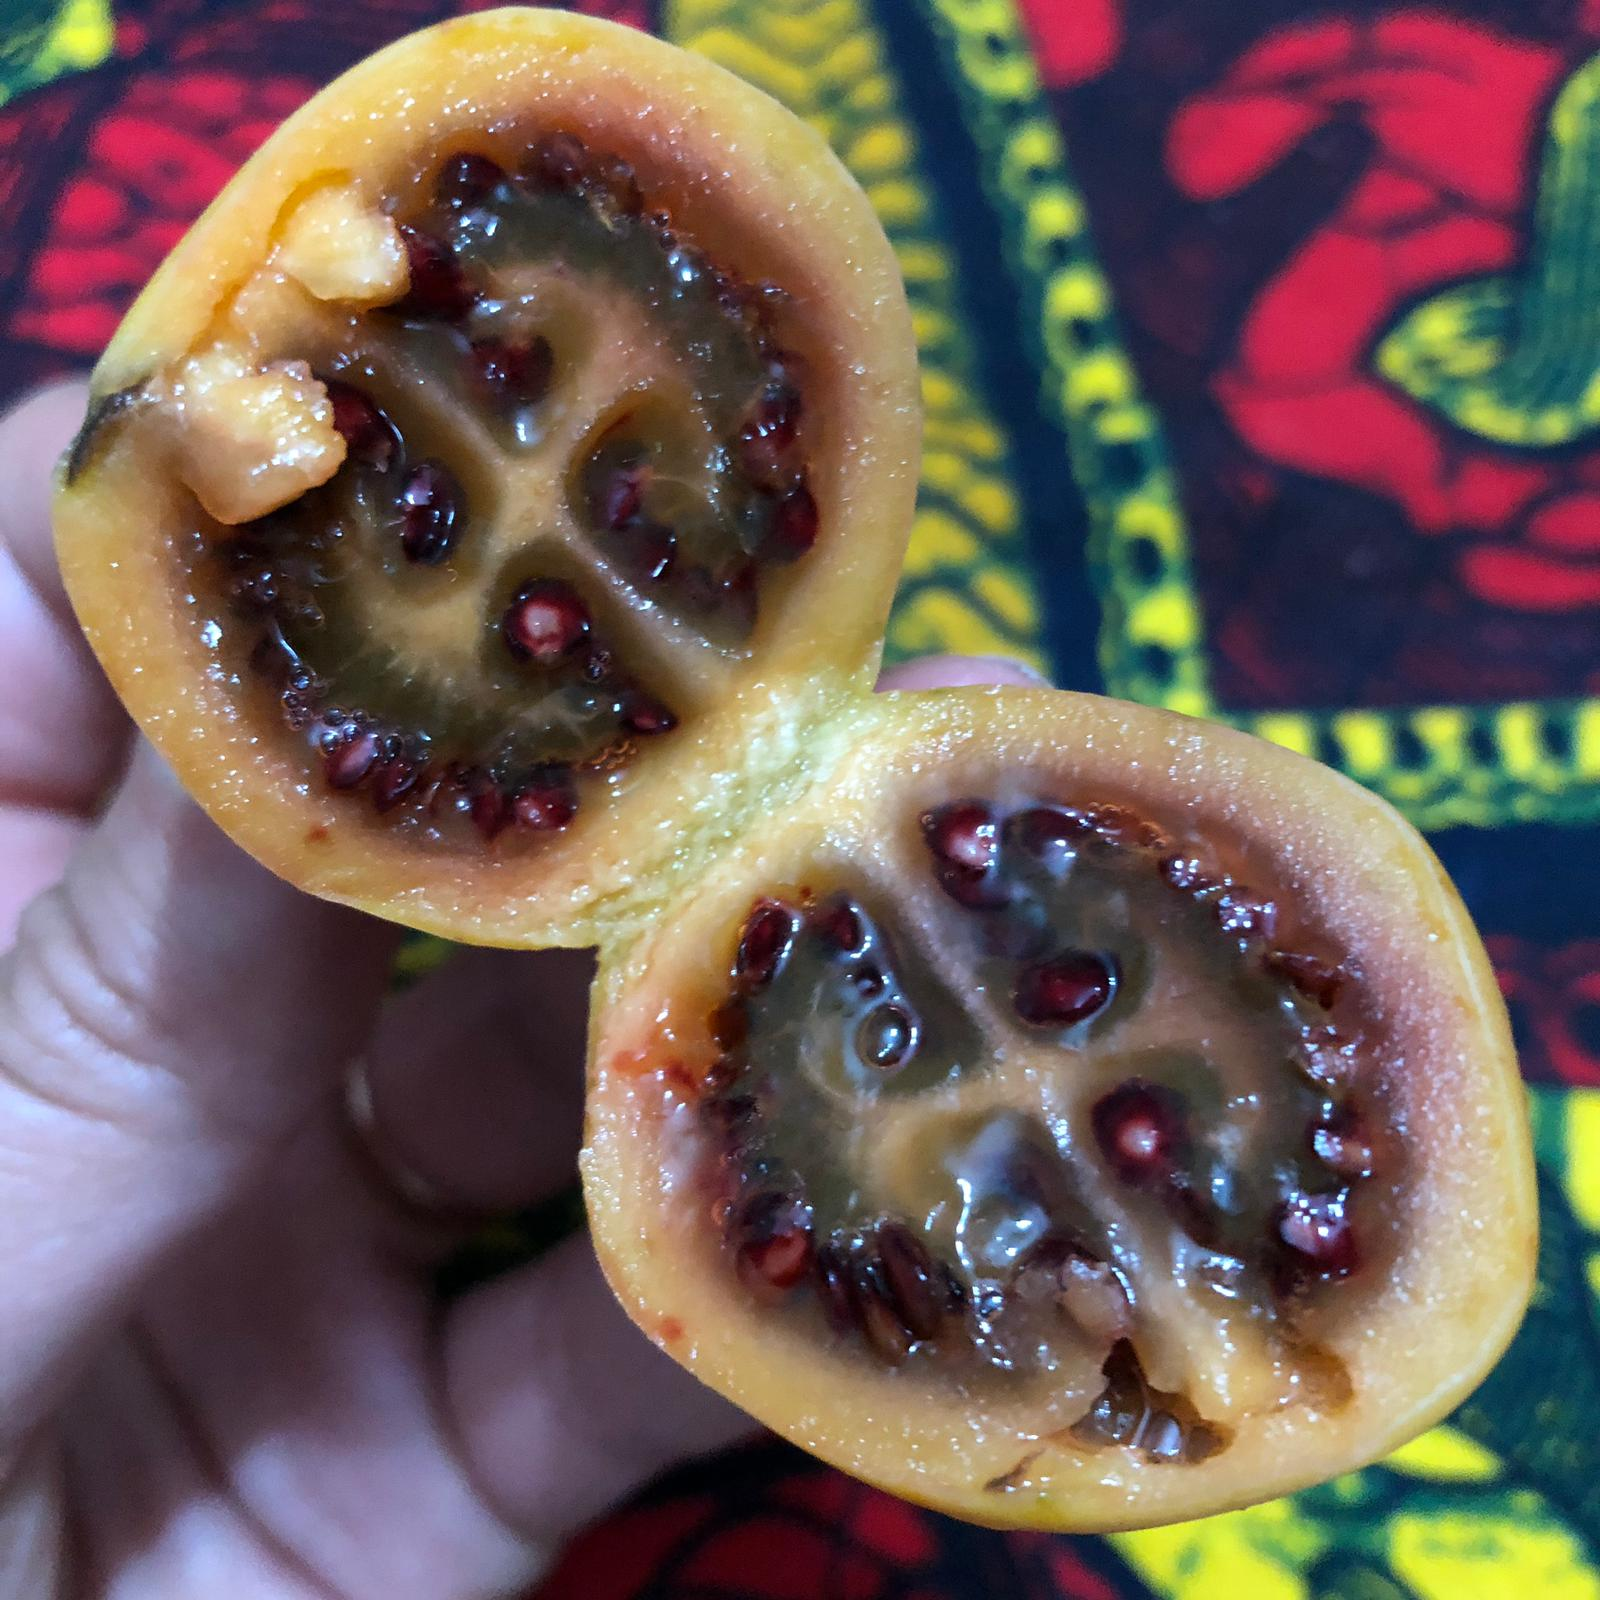 Tree Tomatoes :-) Super lecker